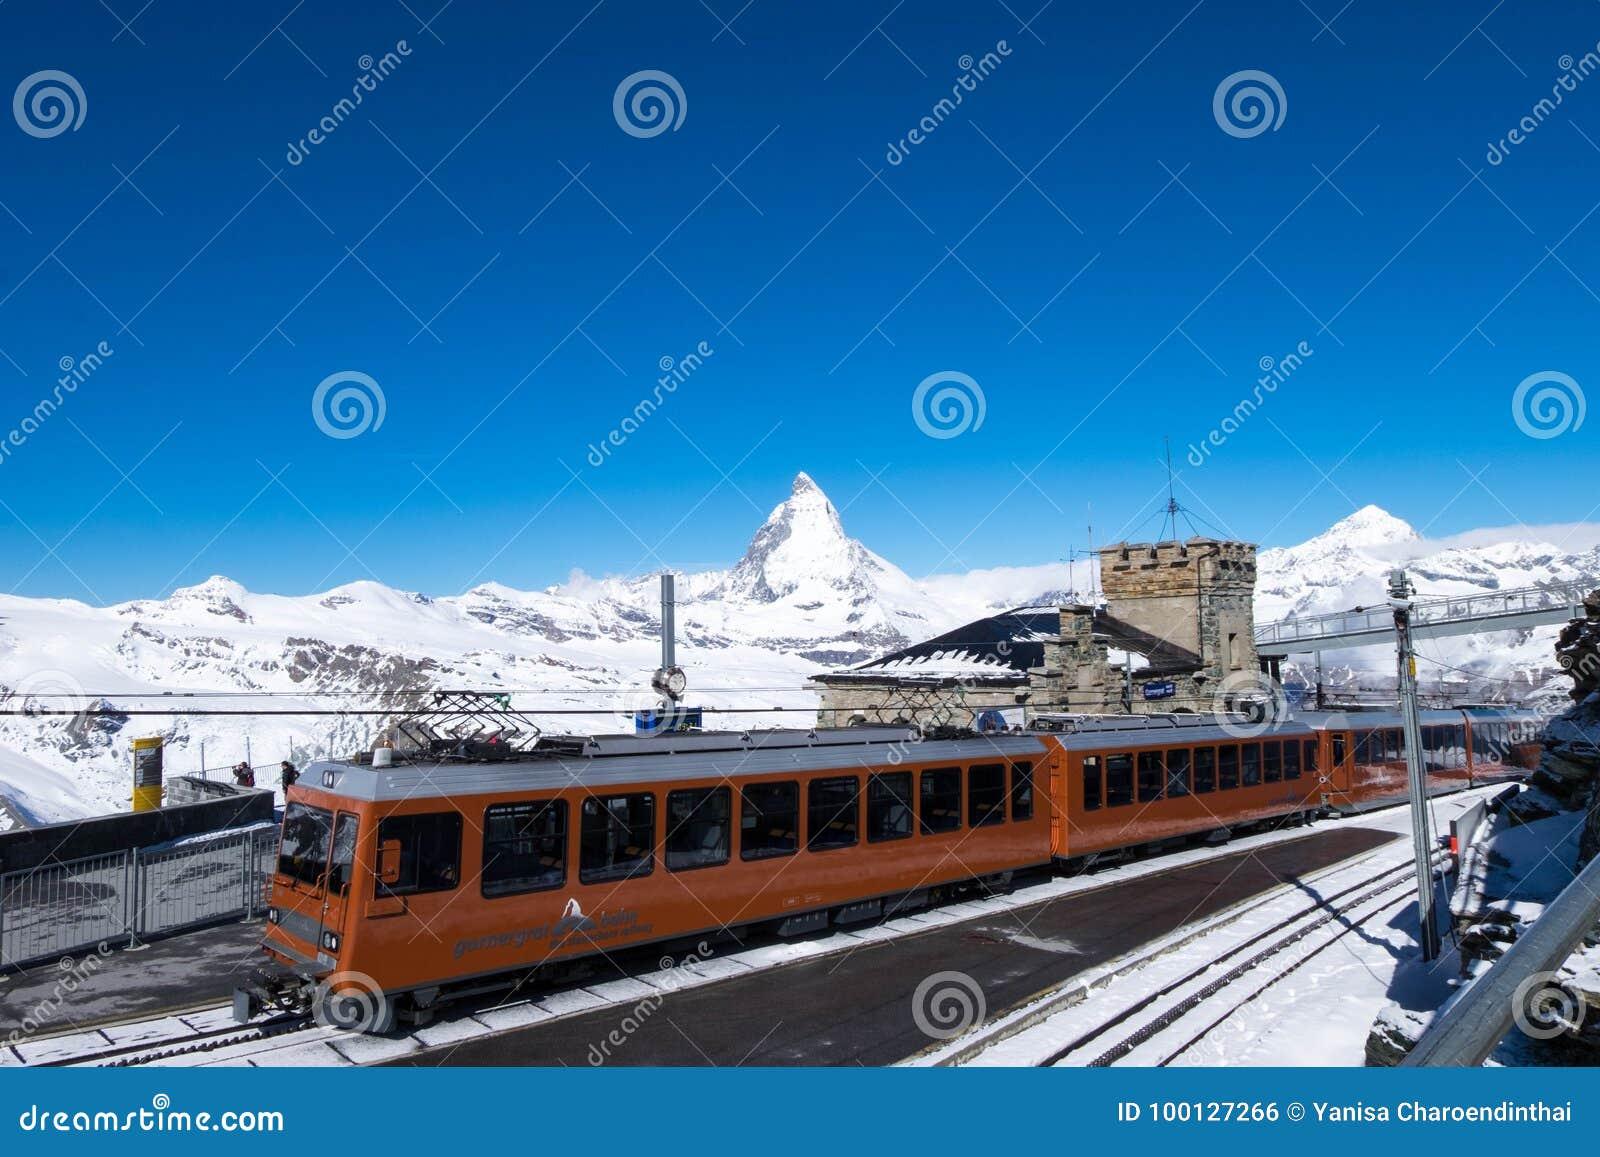 Gornergrat bahn, the only train where services travelers on Matterhorn railway.